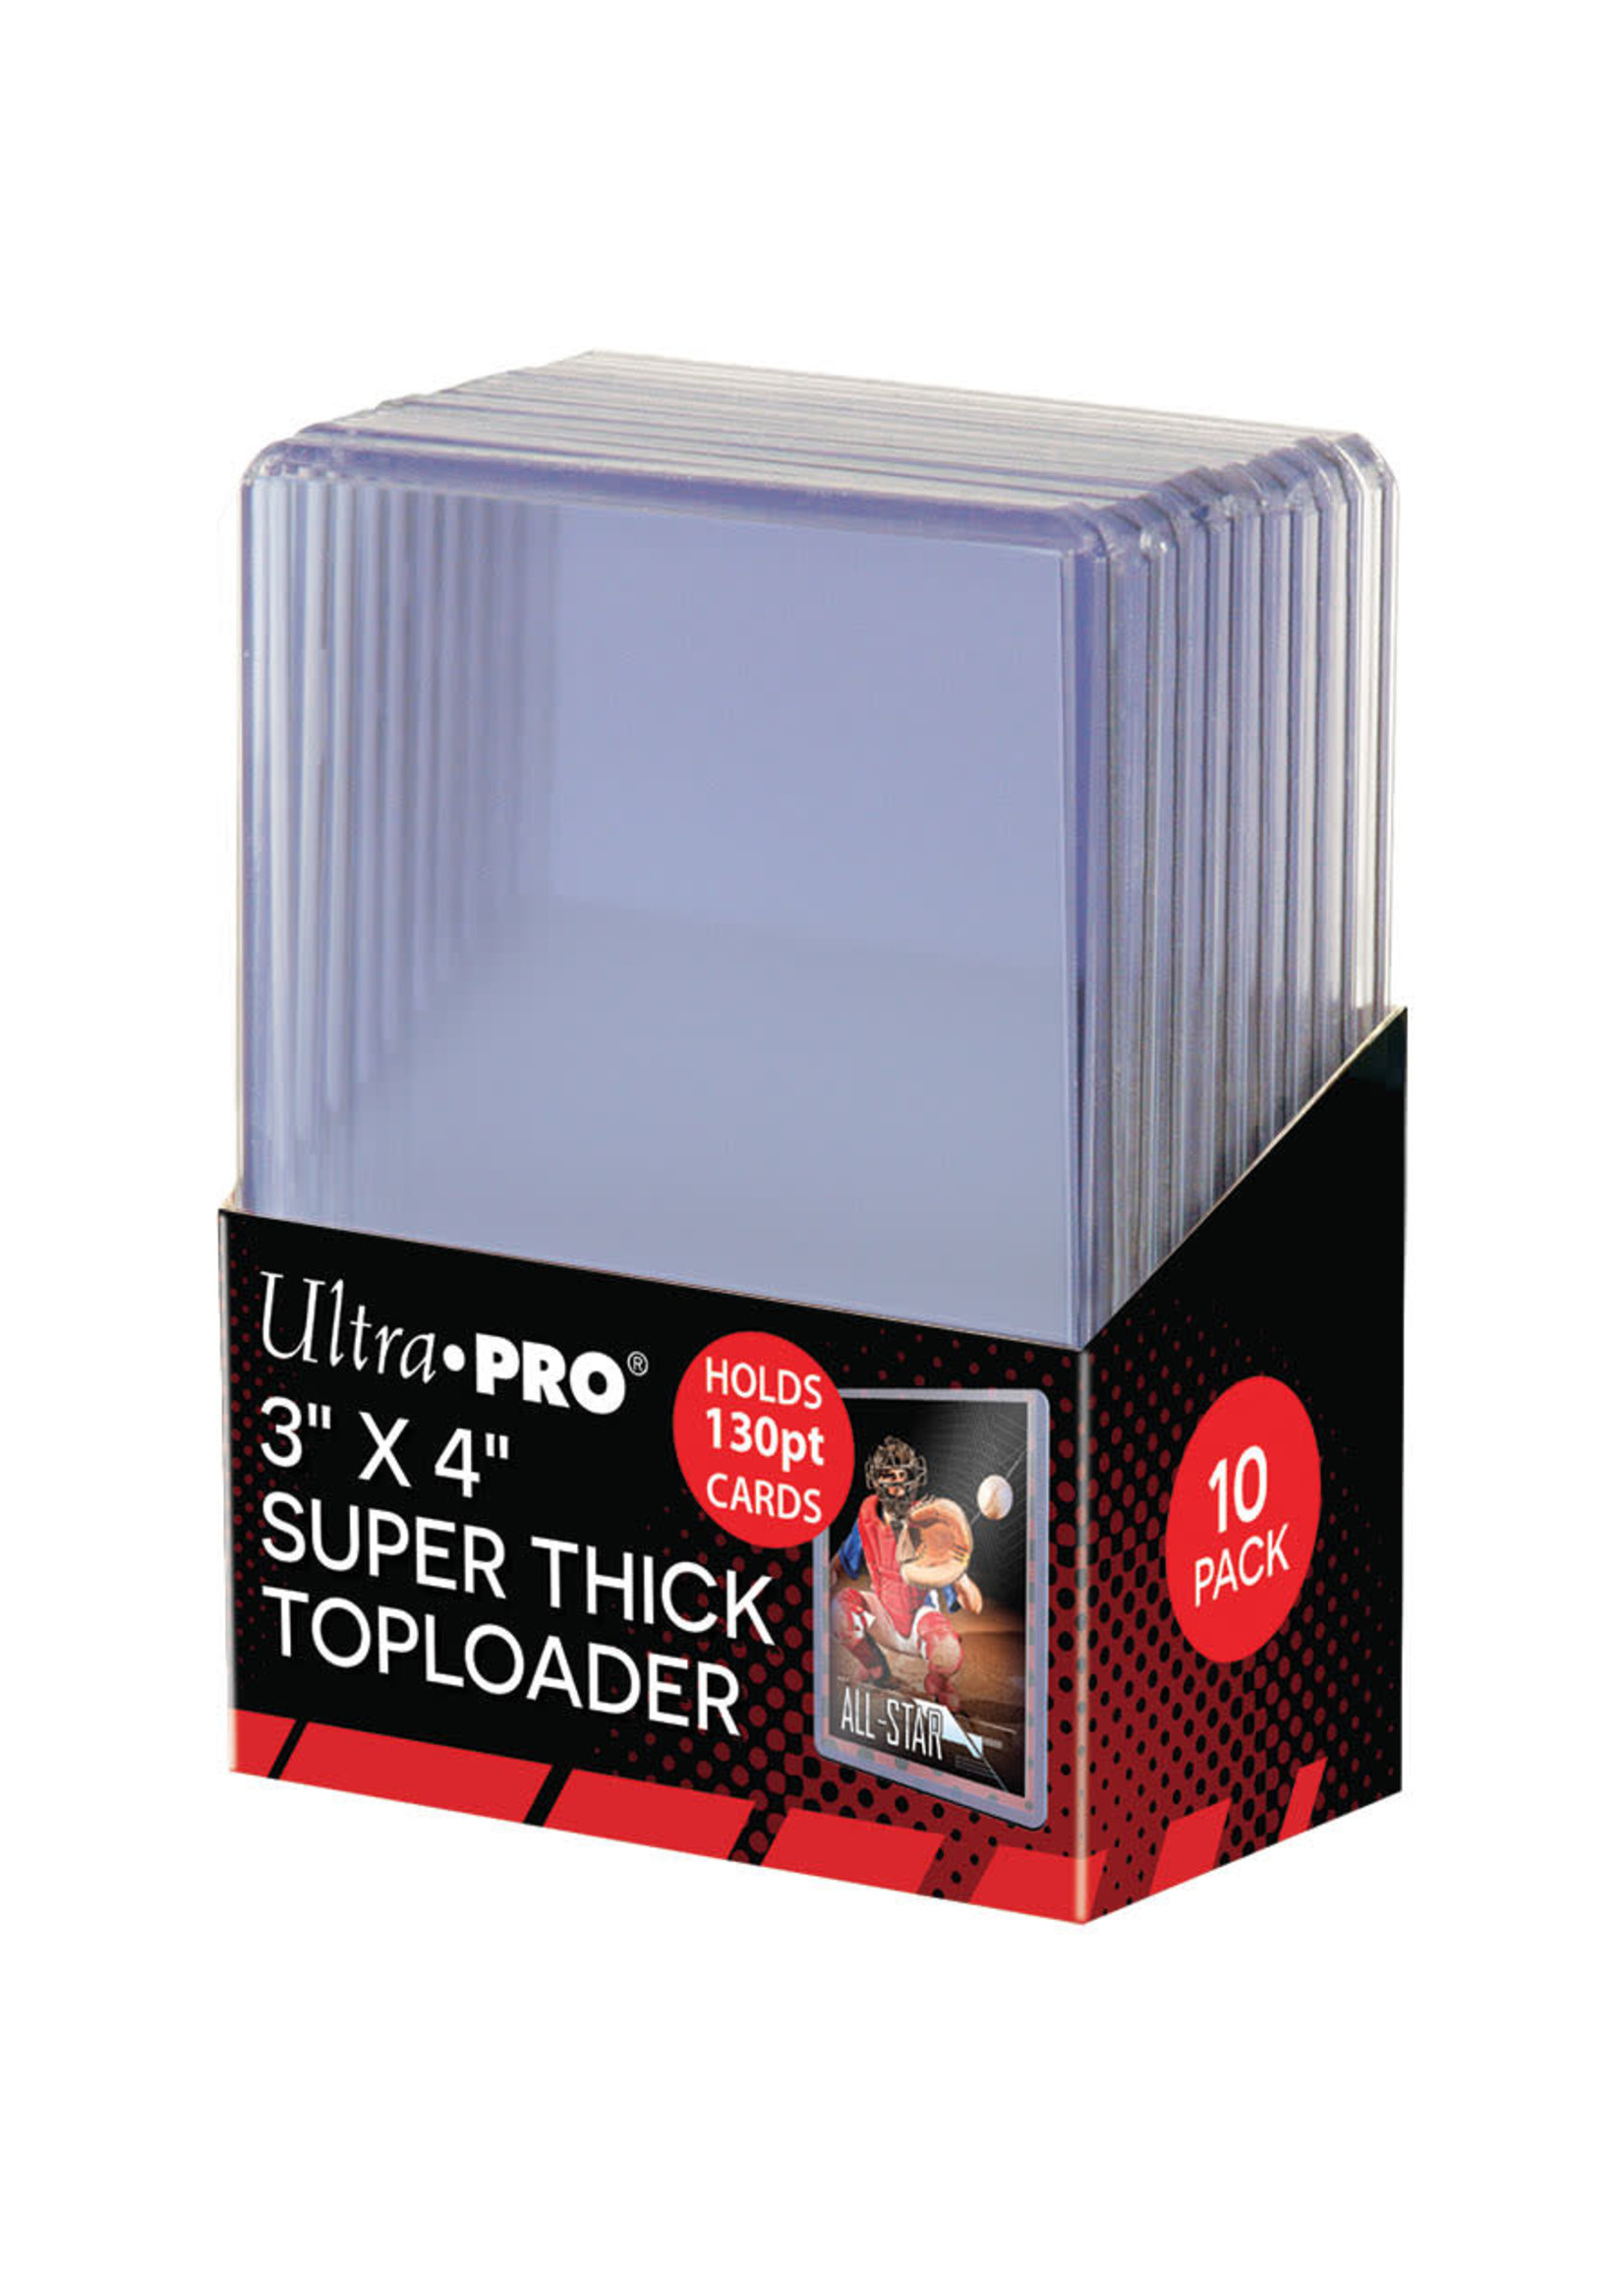 Ultra Pro Ultra Pro Super Thick Toploader 130pt